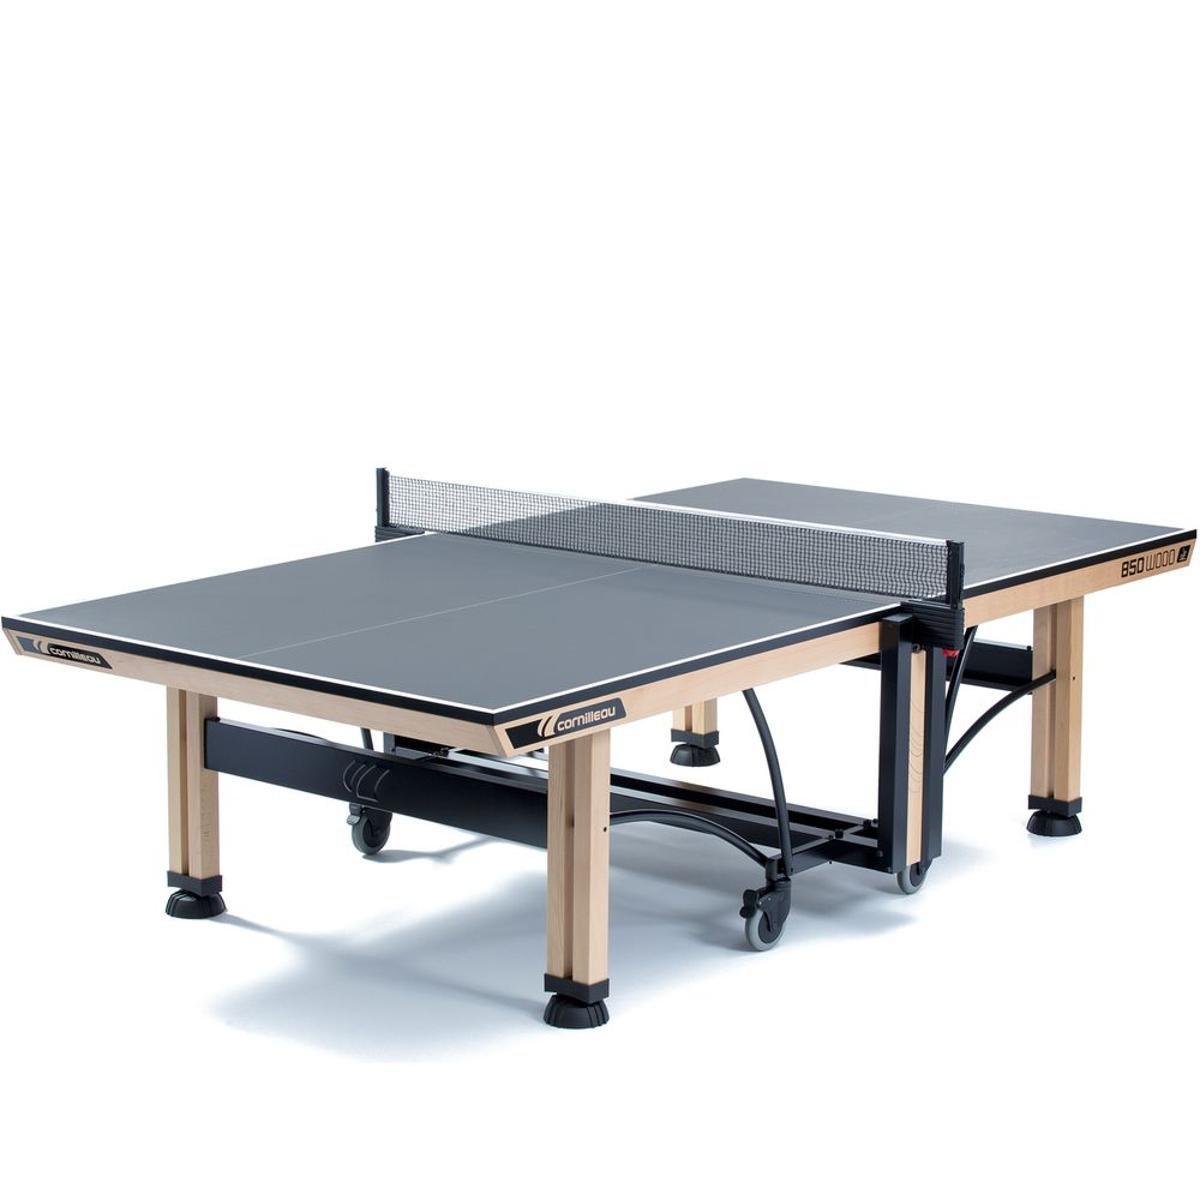 541c0a742 Mesa de Ping Pong   Tênis de Mesa Cornilleau Competição 850 Wood ITTF